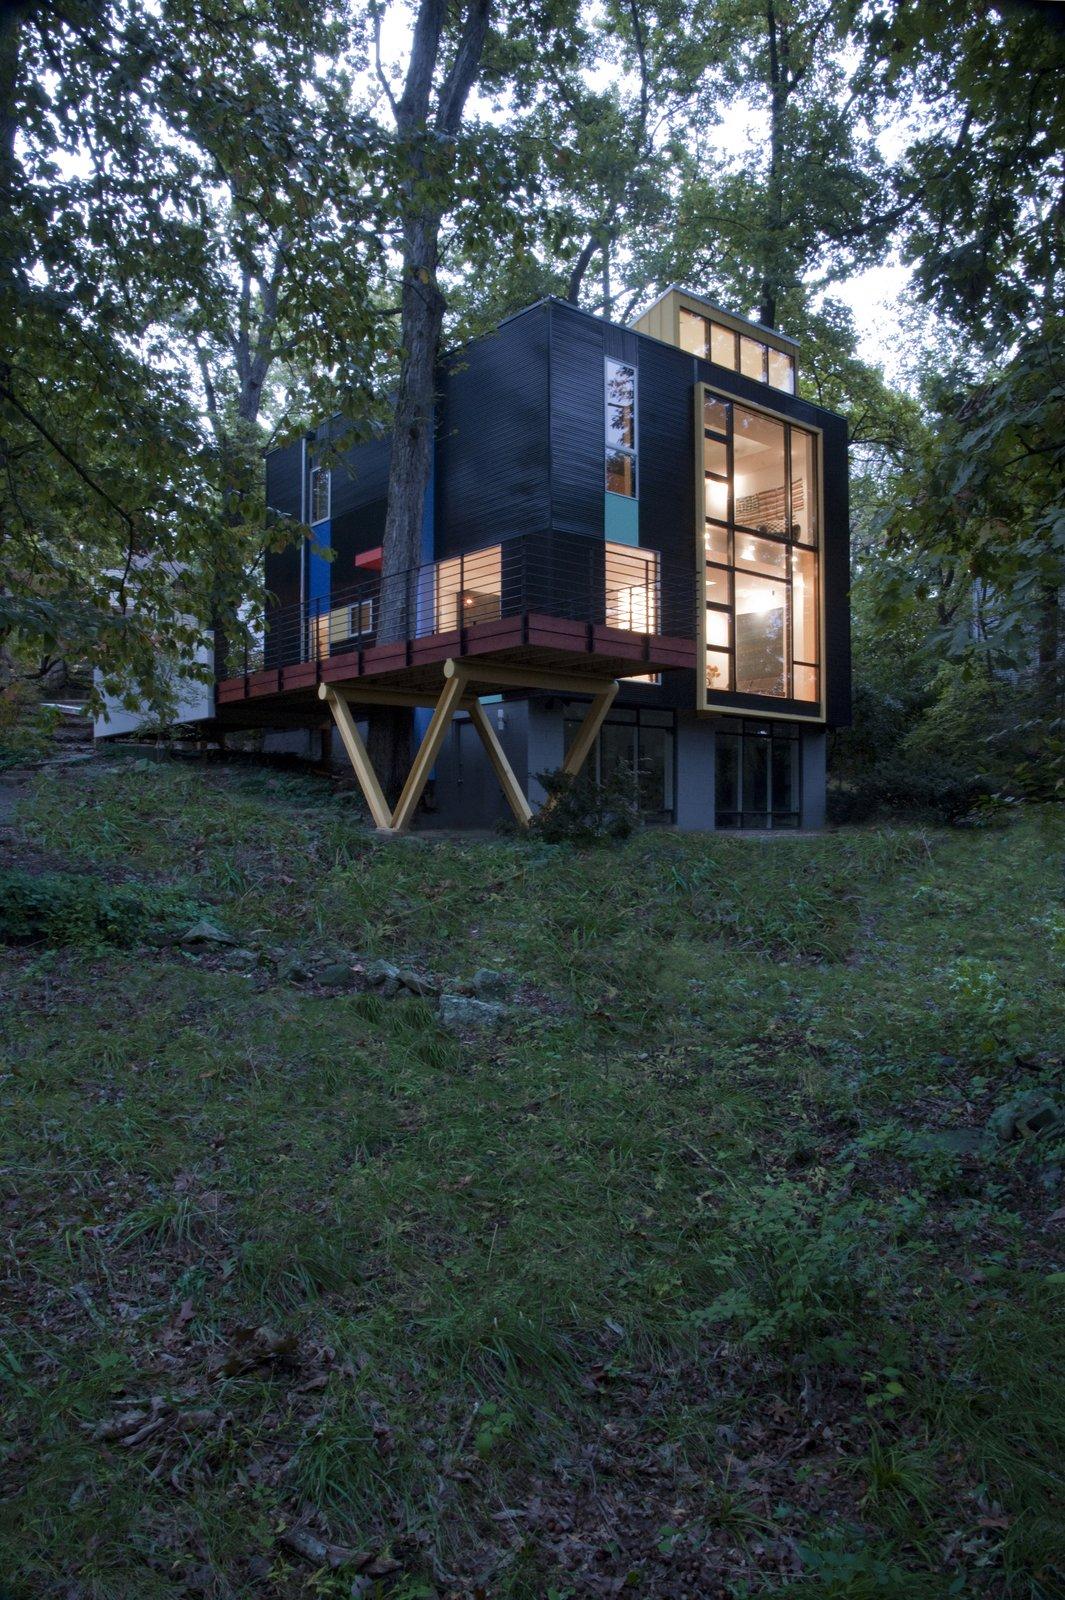 Photo Credit: McInturff Architects